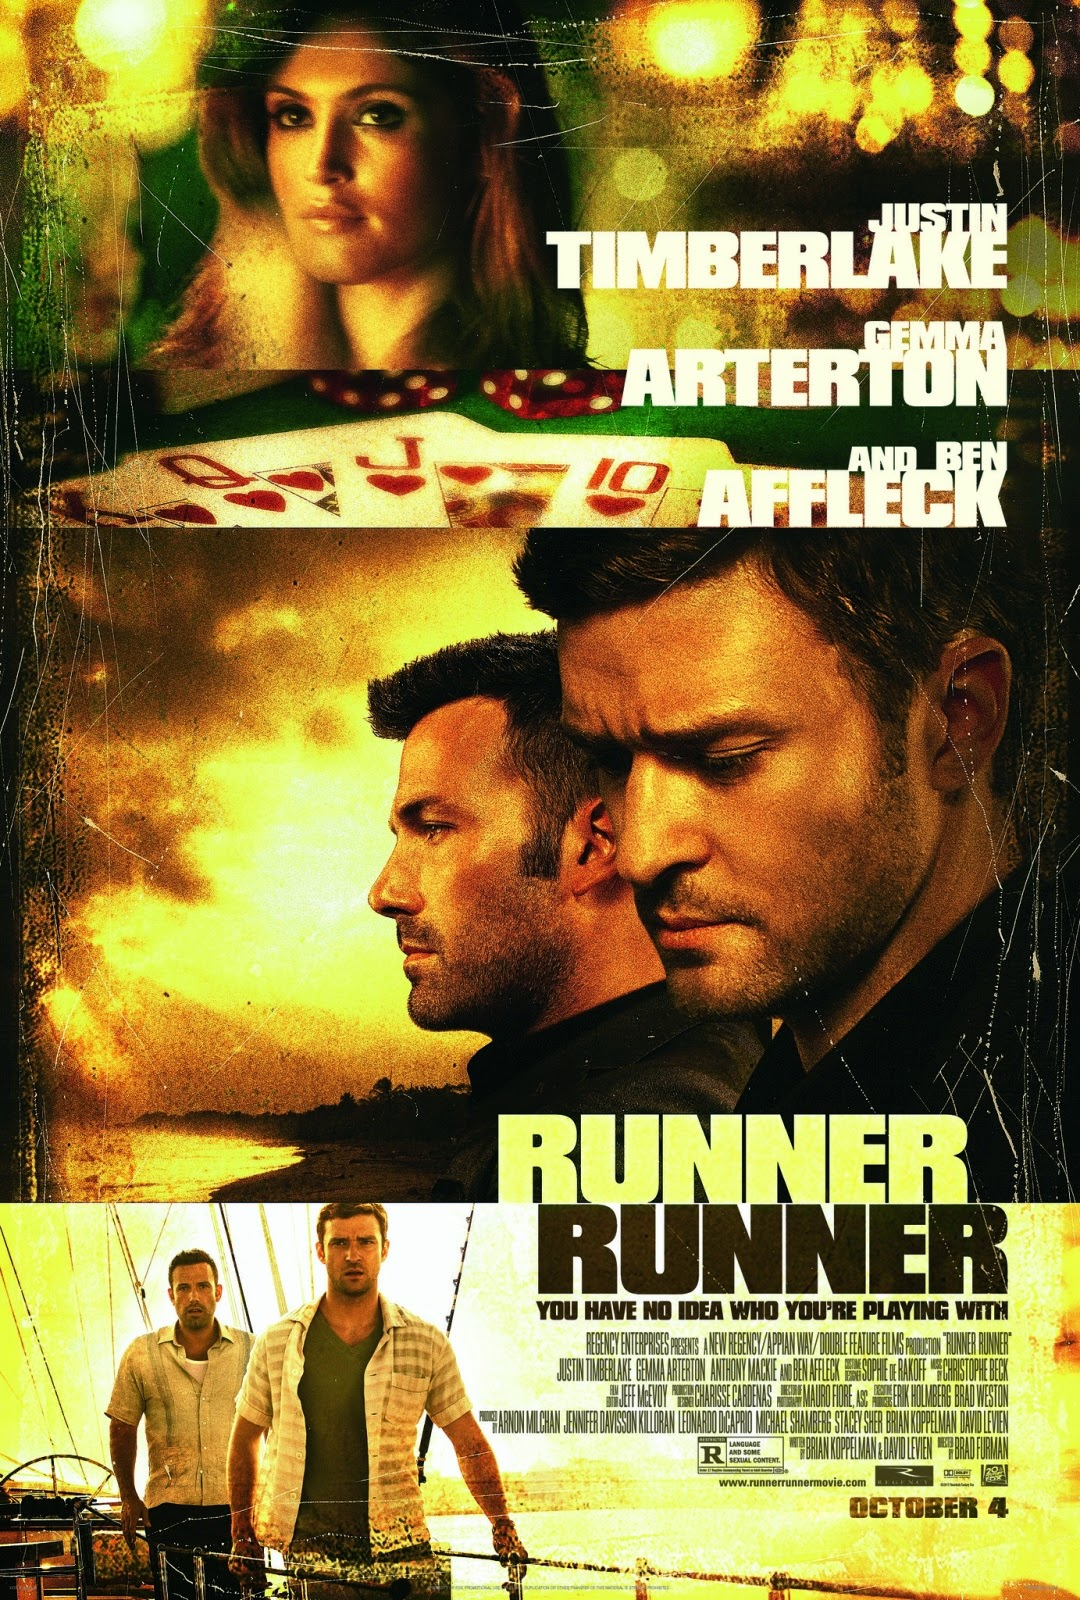 Runner Runner ตัดเหลี่ยมเดิมพันอันตราย [HD][พากย์ไทย]